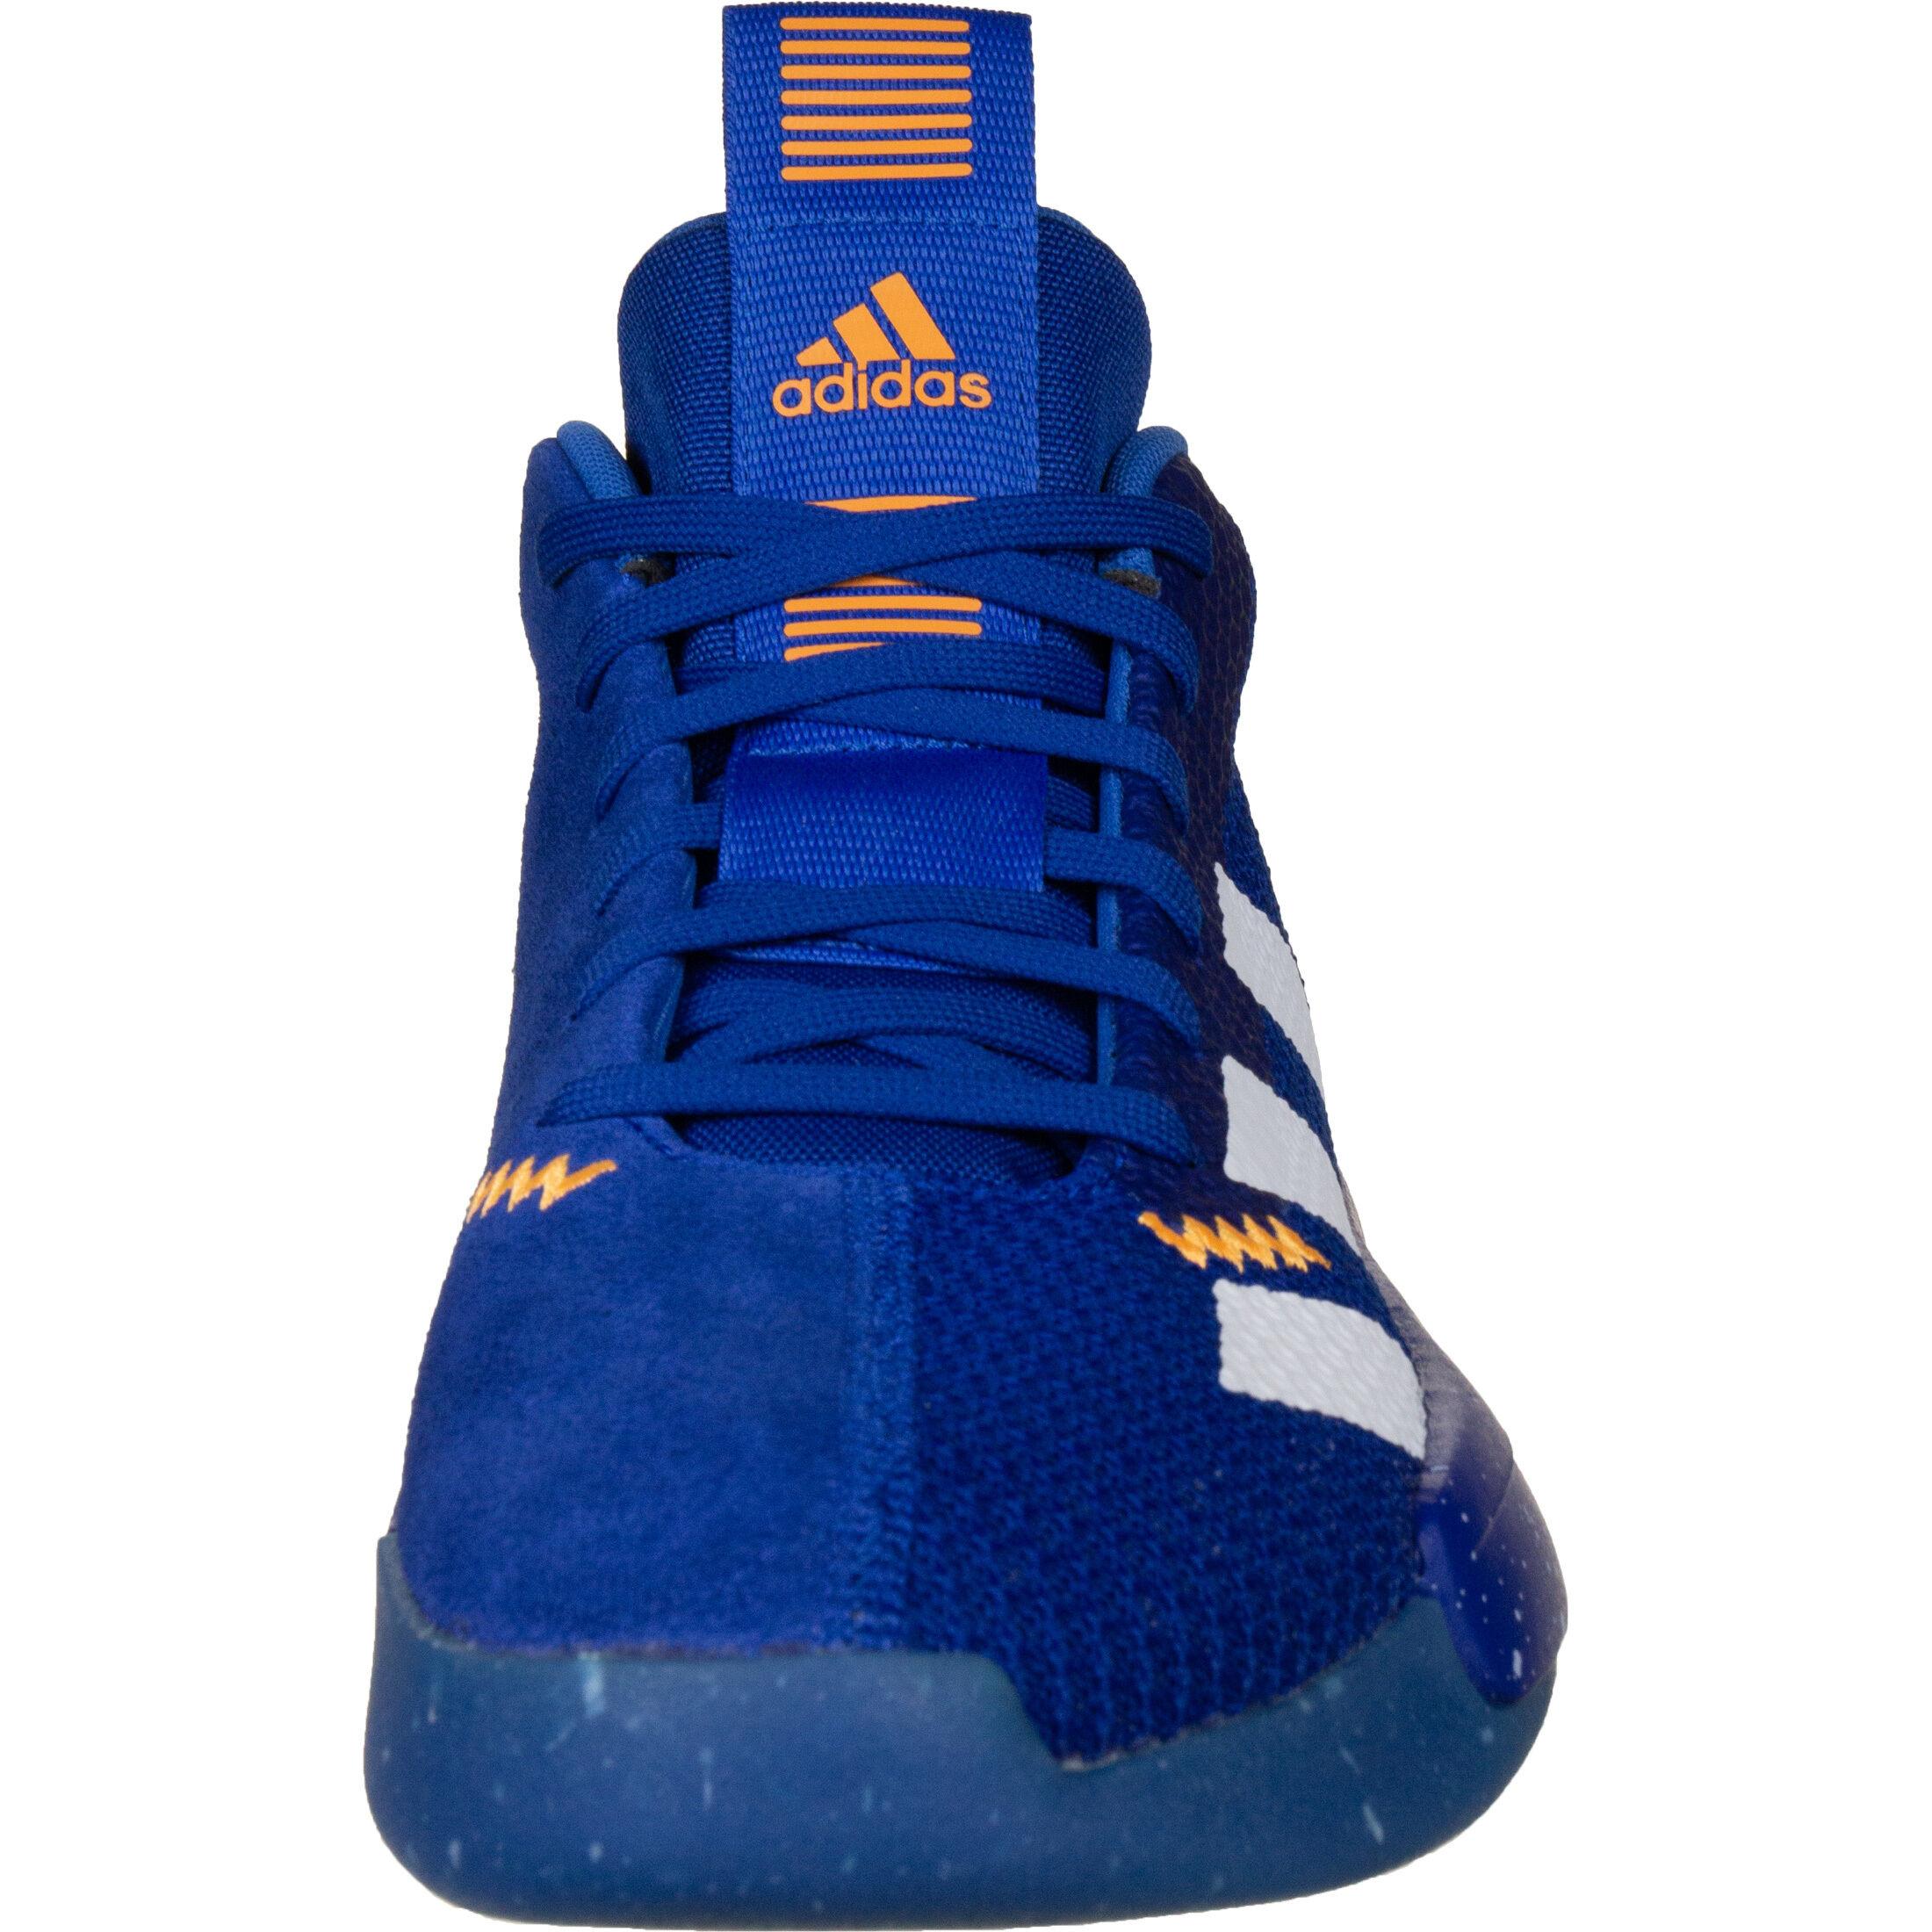 adidas Performance Pro Next 2019 Basketballschuh Herren bei